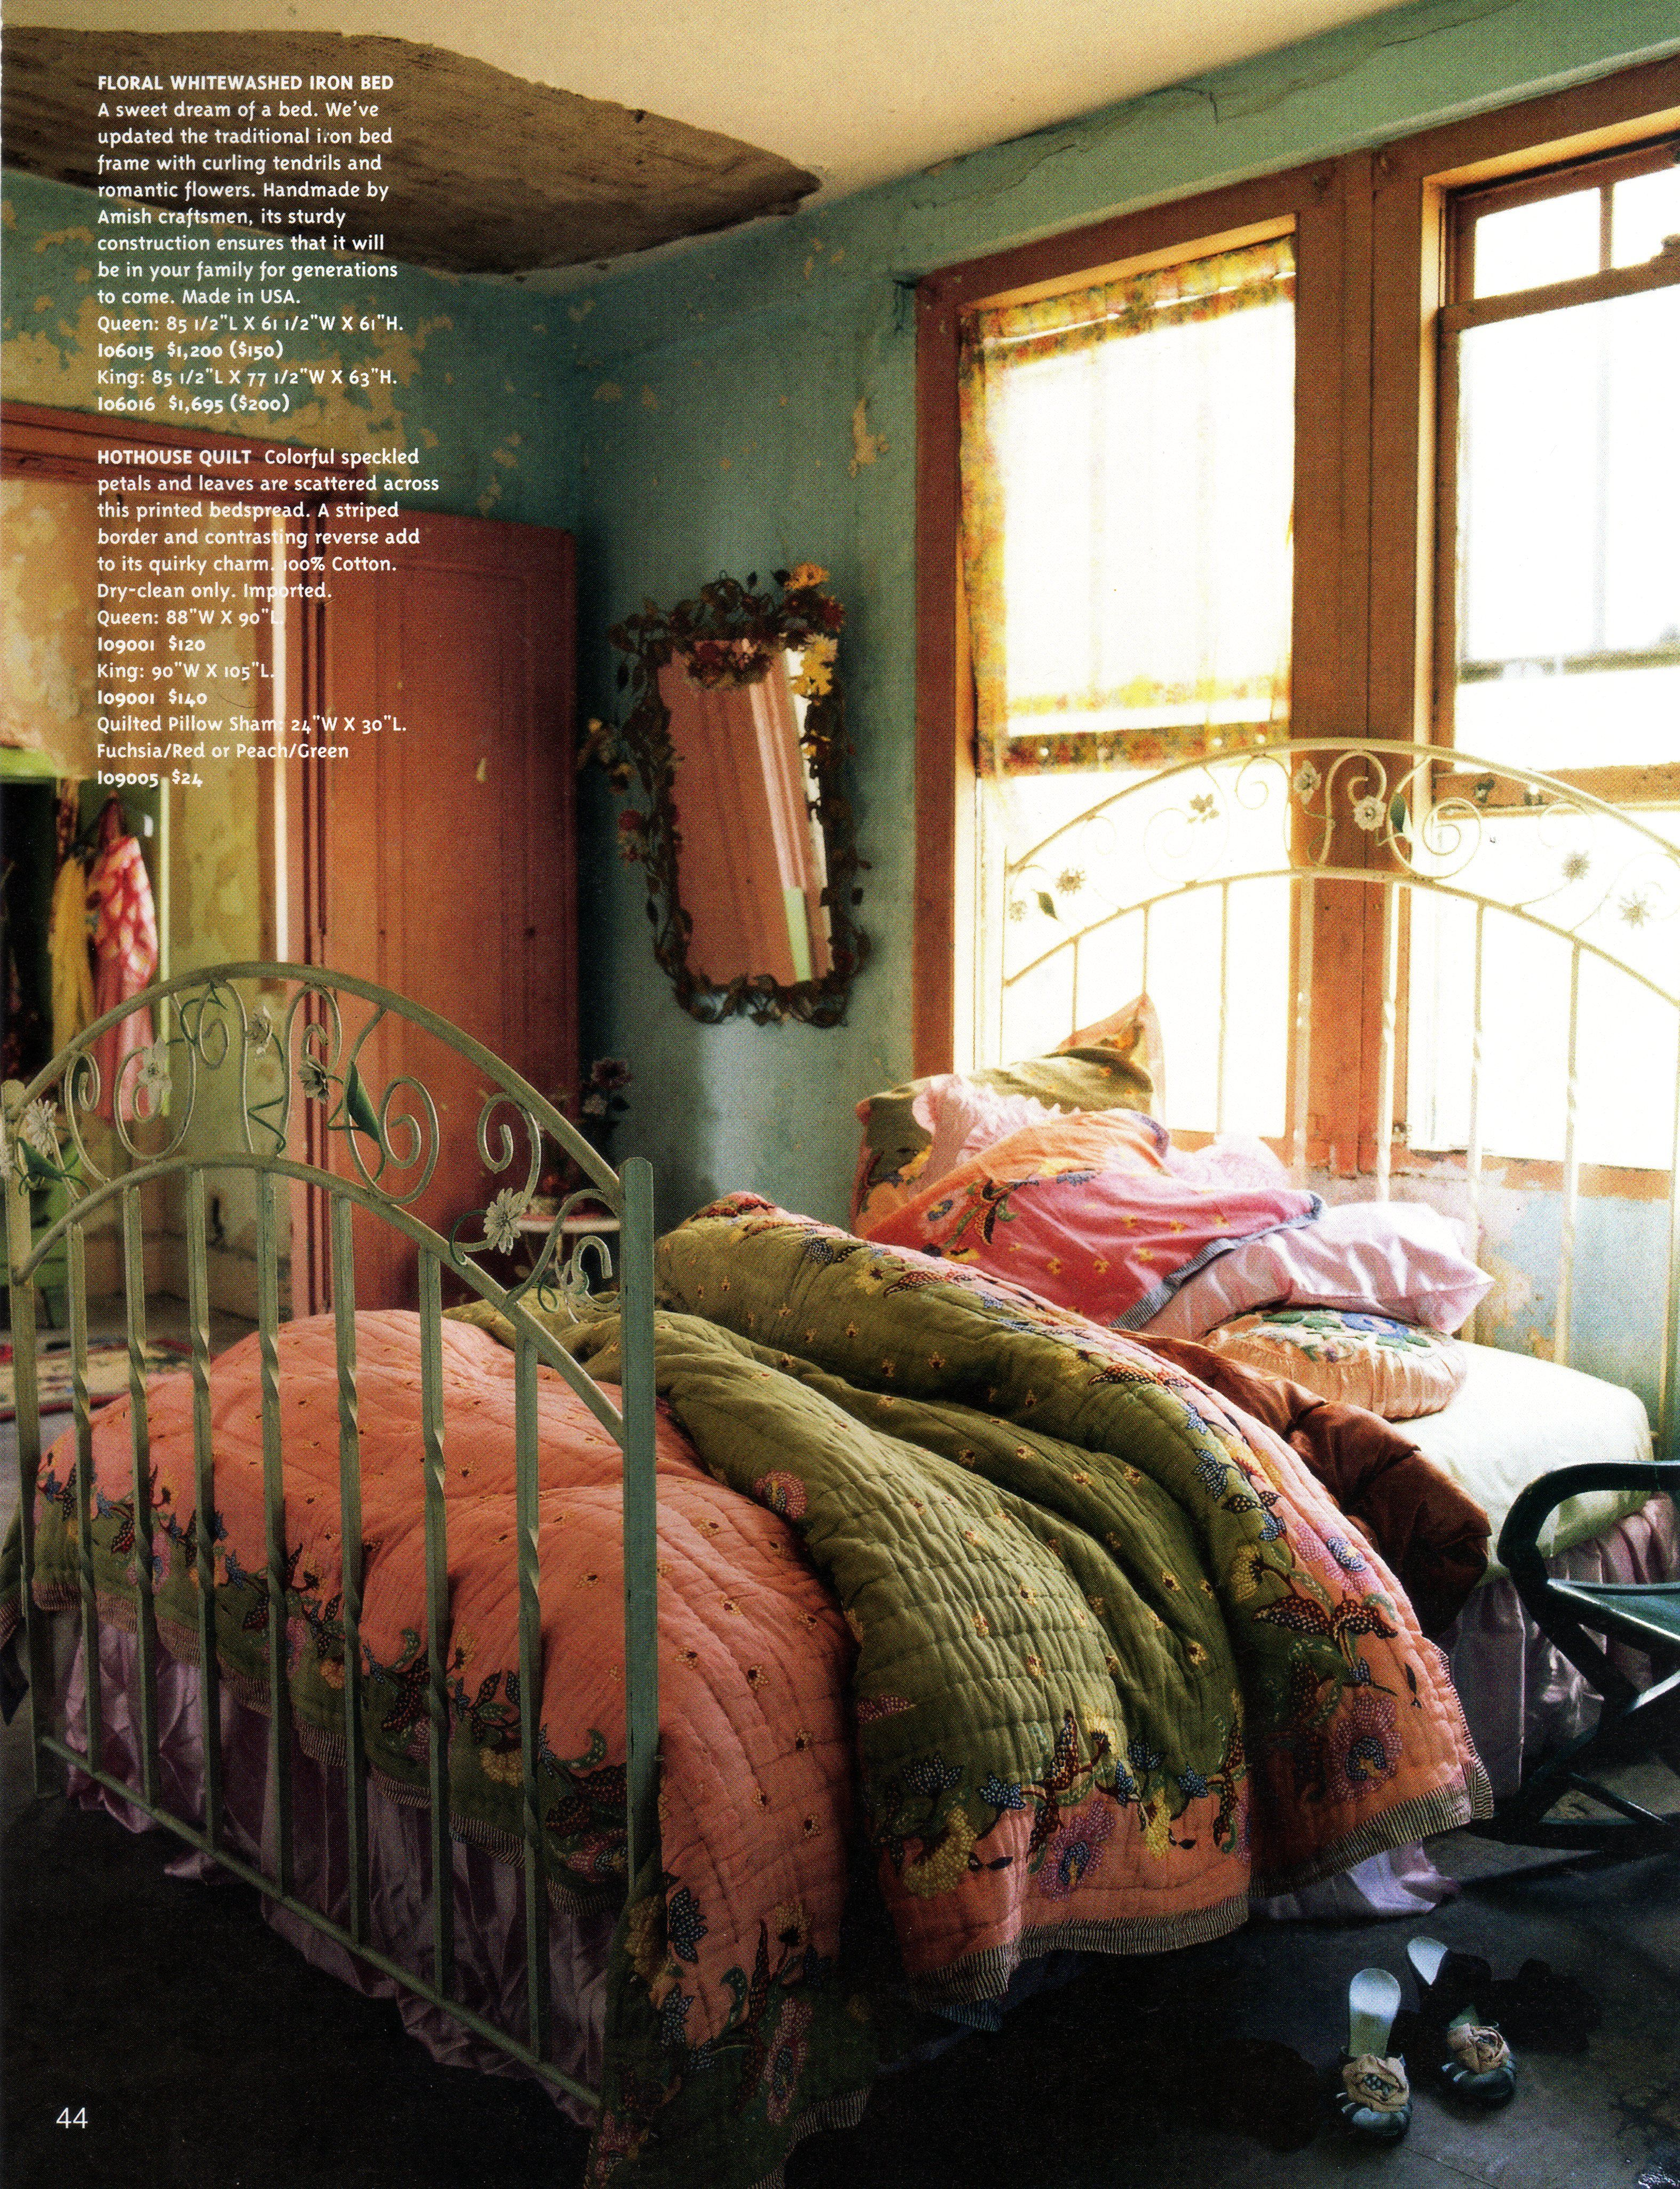 Pin de Gabrielle Craven en Bedroom   Pinterest   Dormitorio, Casas ...